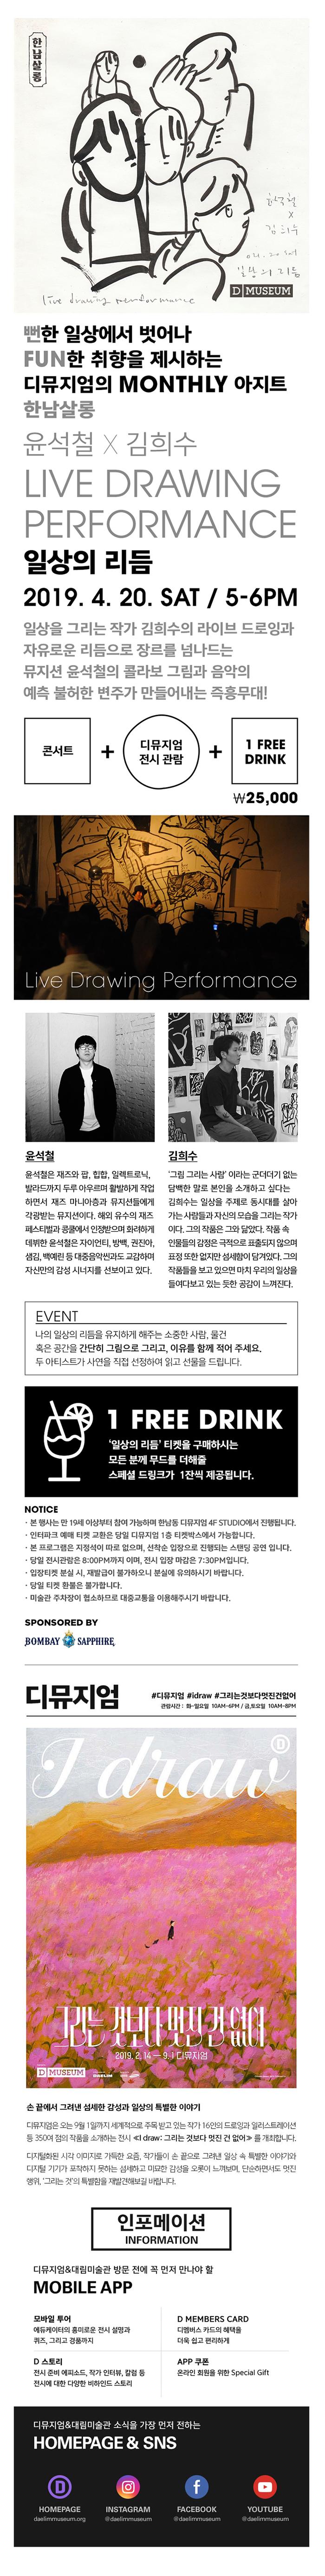 Idraw_한남살롱_4월_인터파크(1)-.jpg